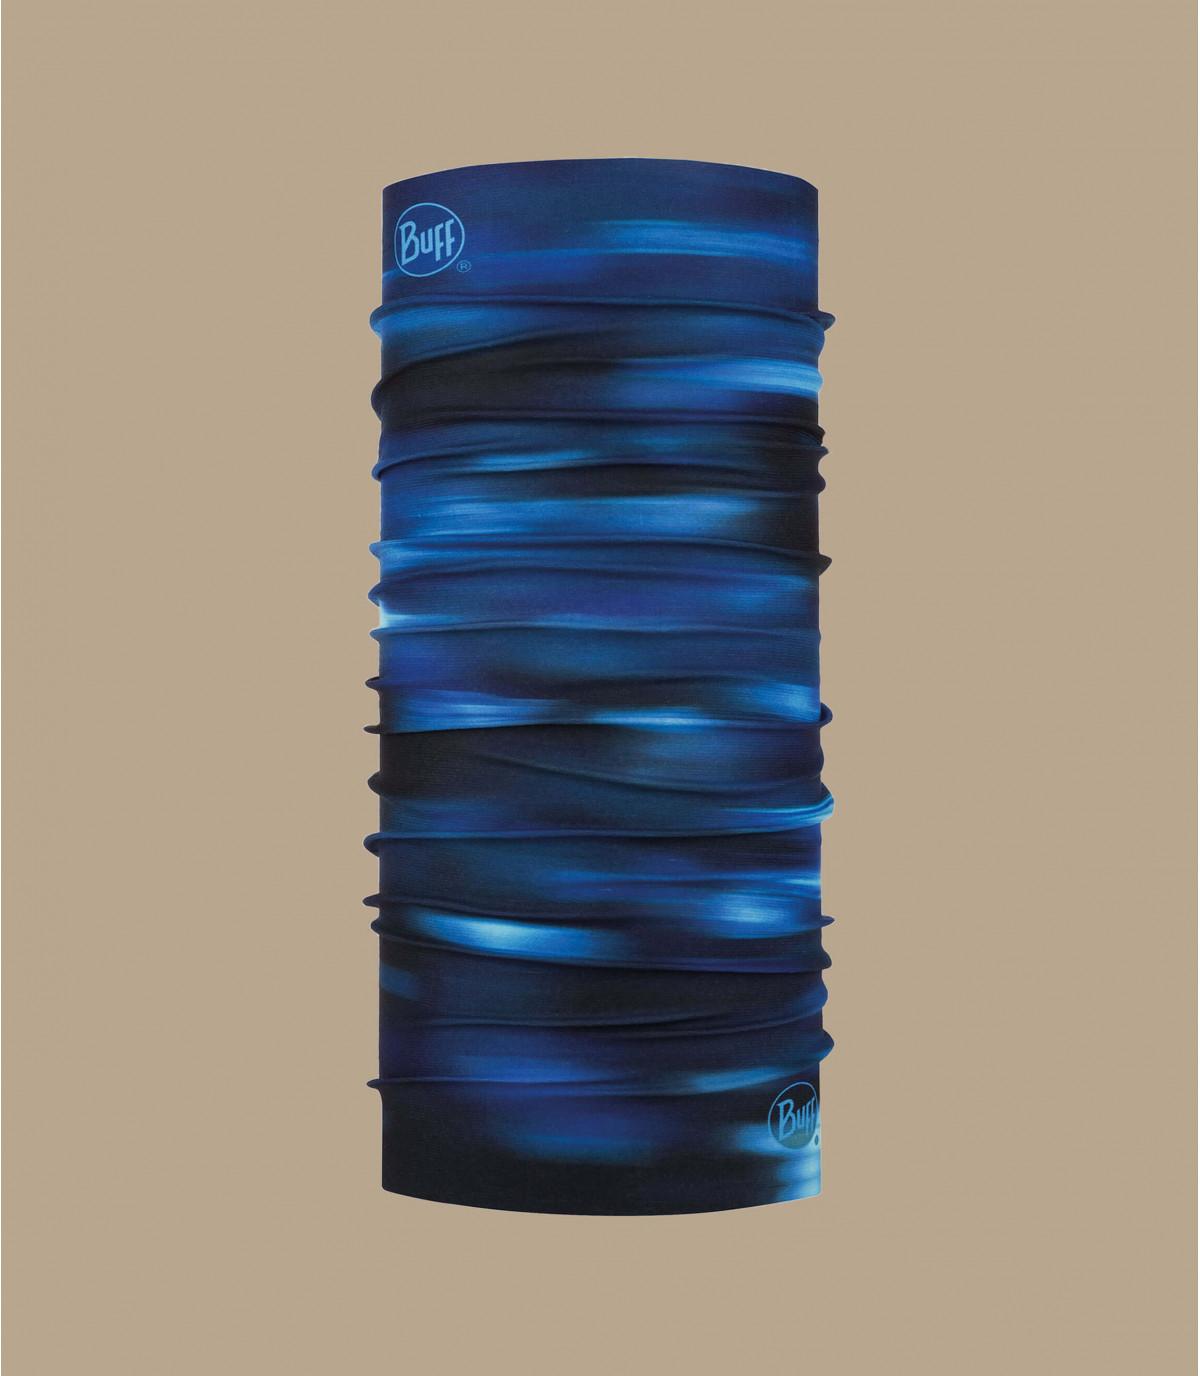 Buff afgedrukt blauw zwart